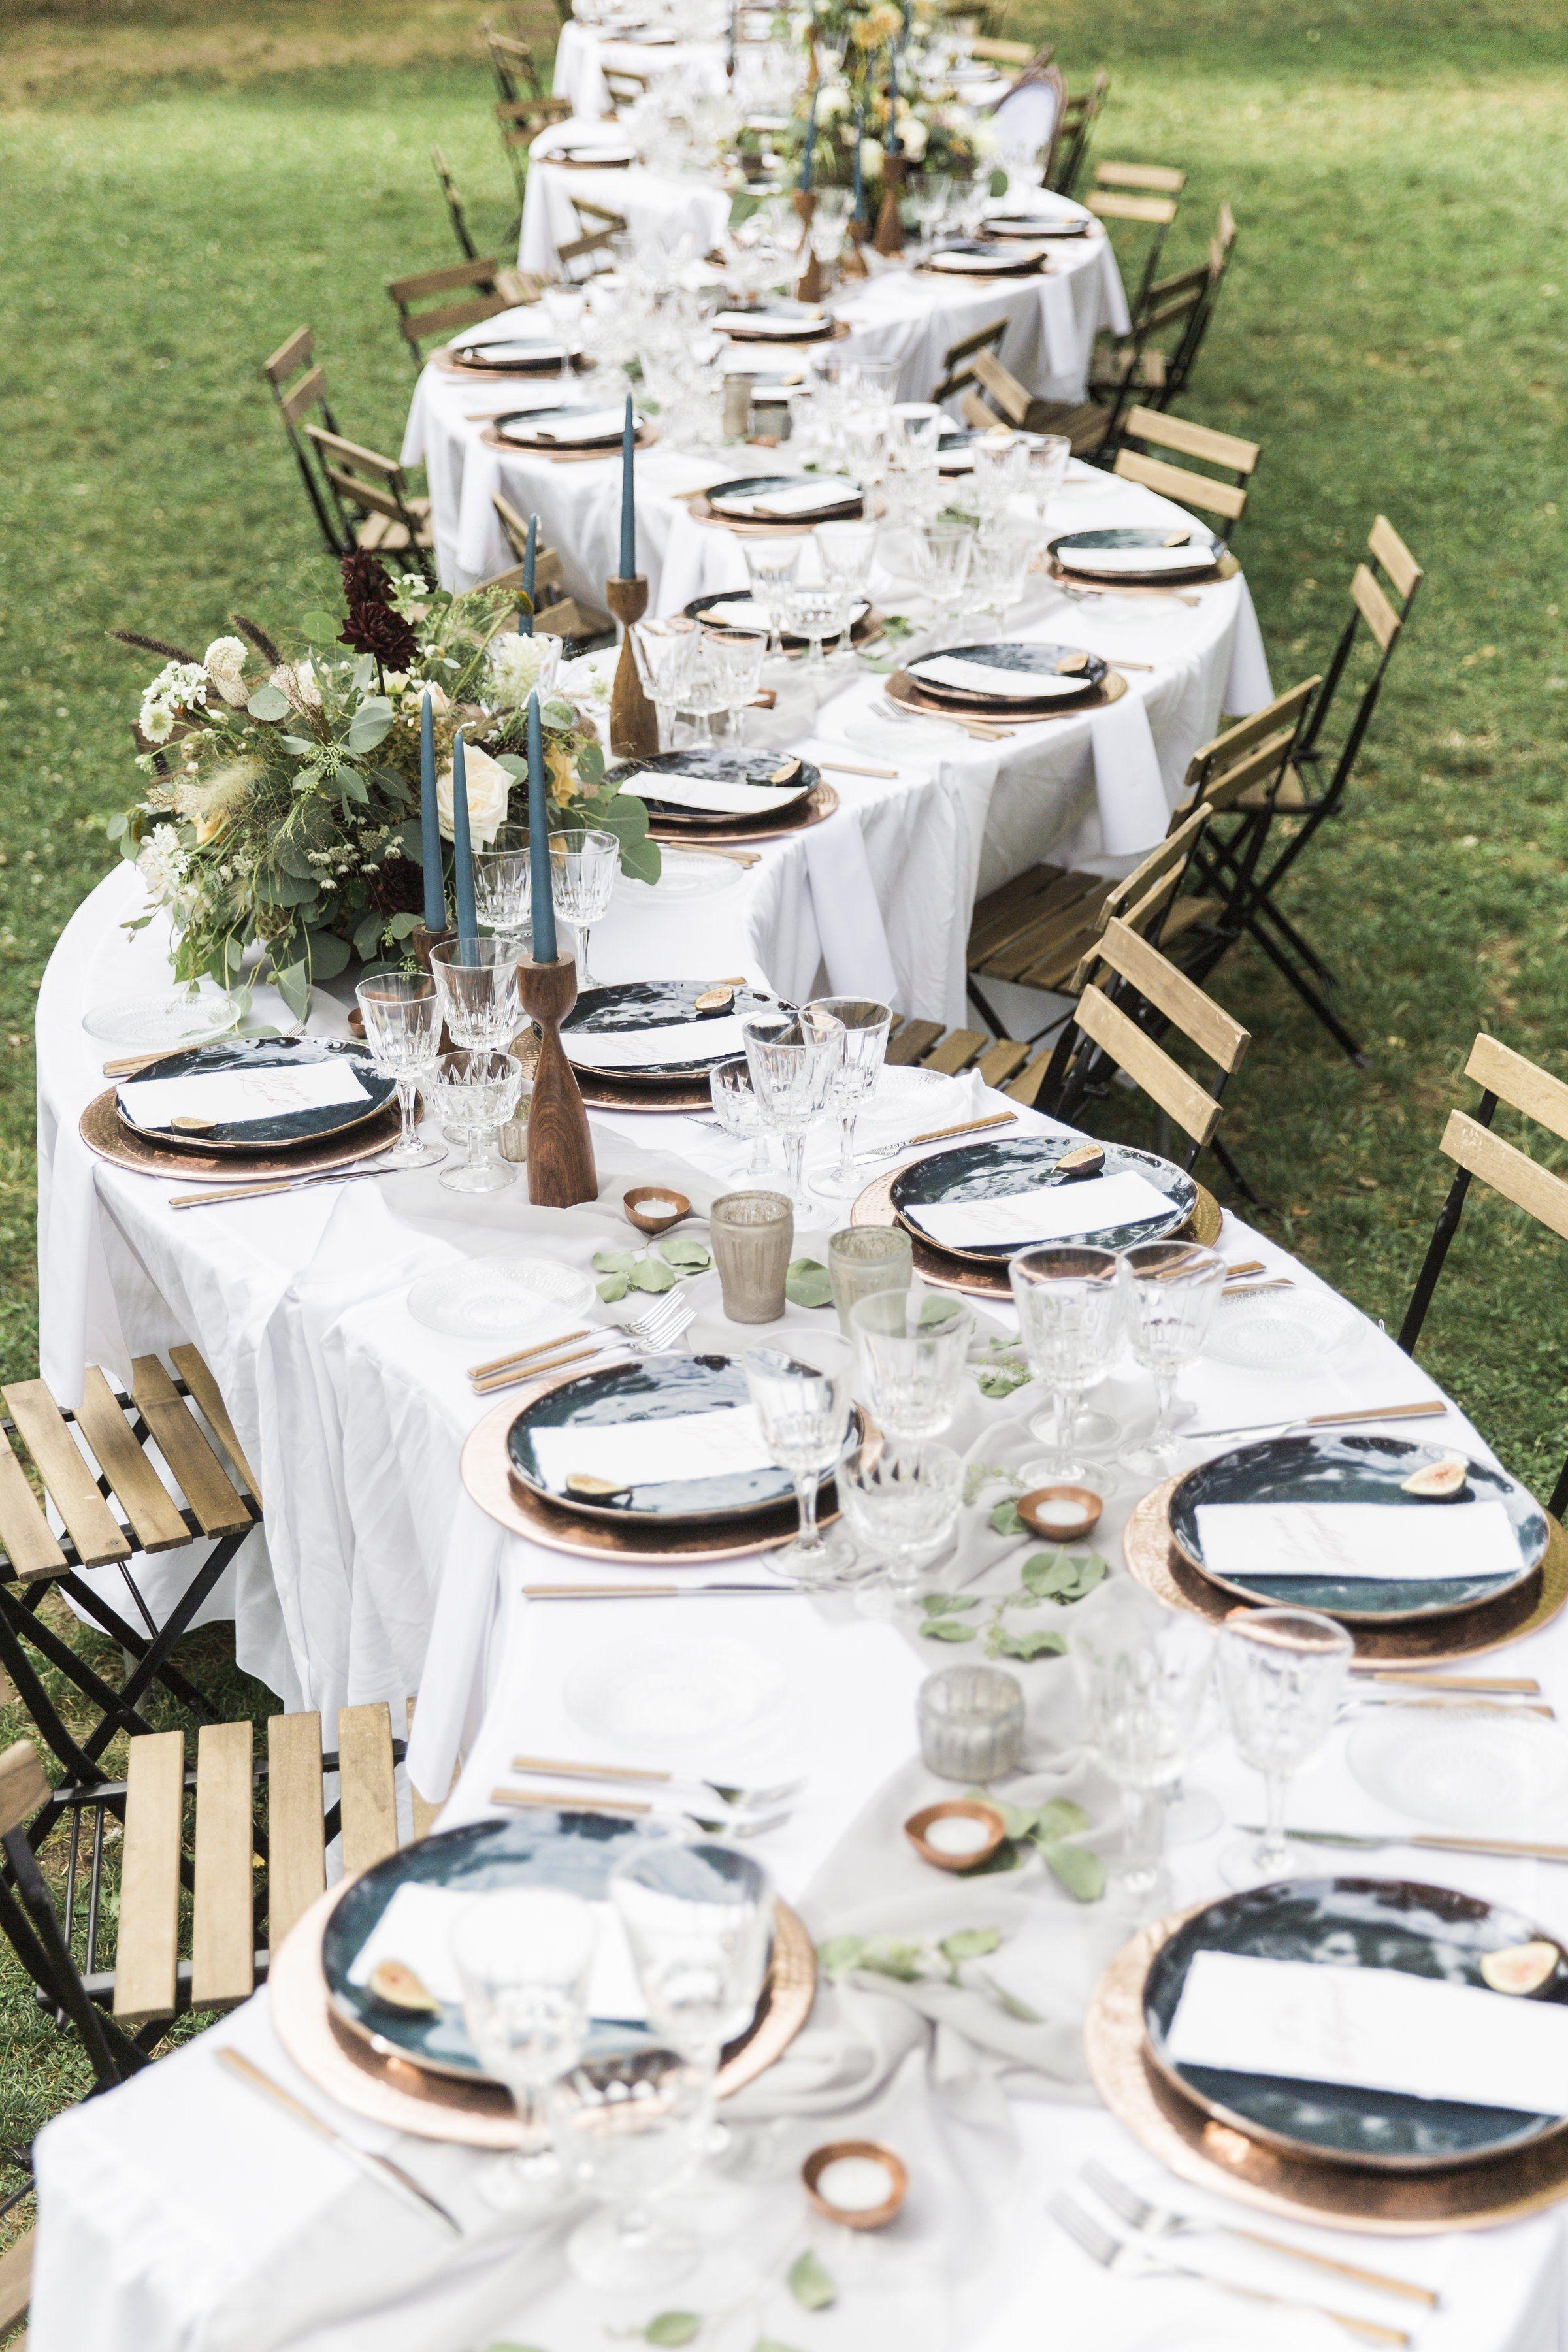 6 Unique Wedding Reception Seating Ideas Brides Table Arrangements Wedding Wedding Table Decorations Vintage Vintage Wedding Table